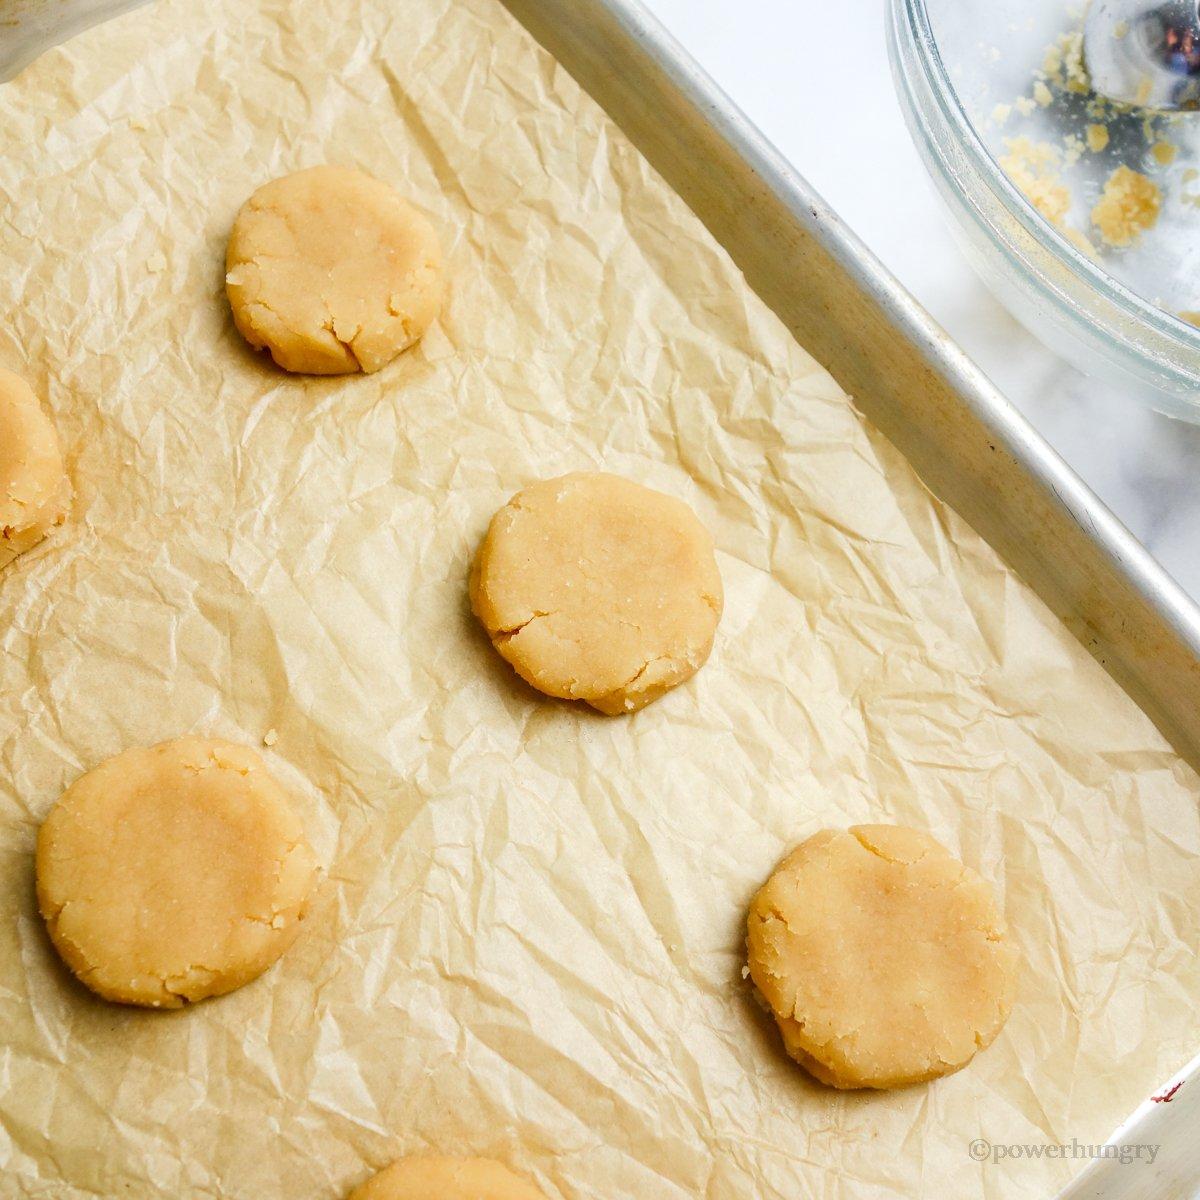 unbaked coconut flour shortbread on a baking sheet